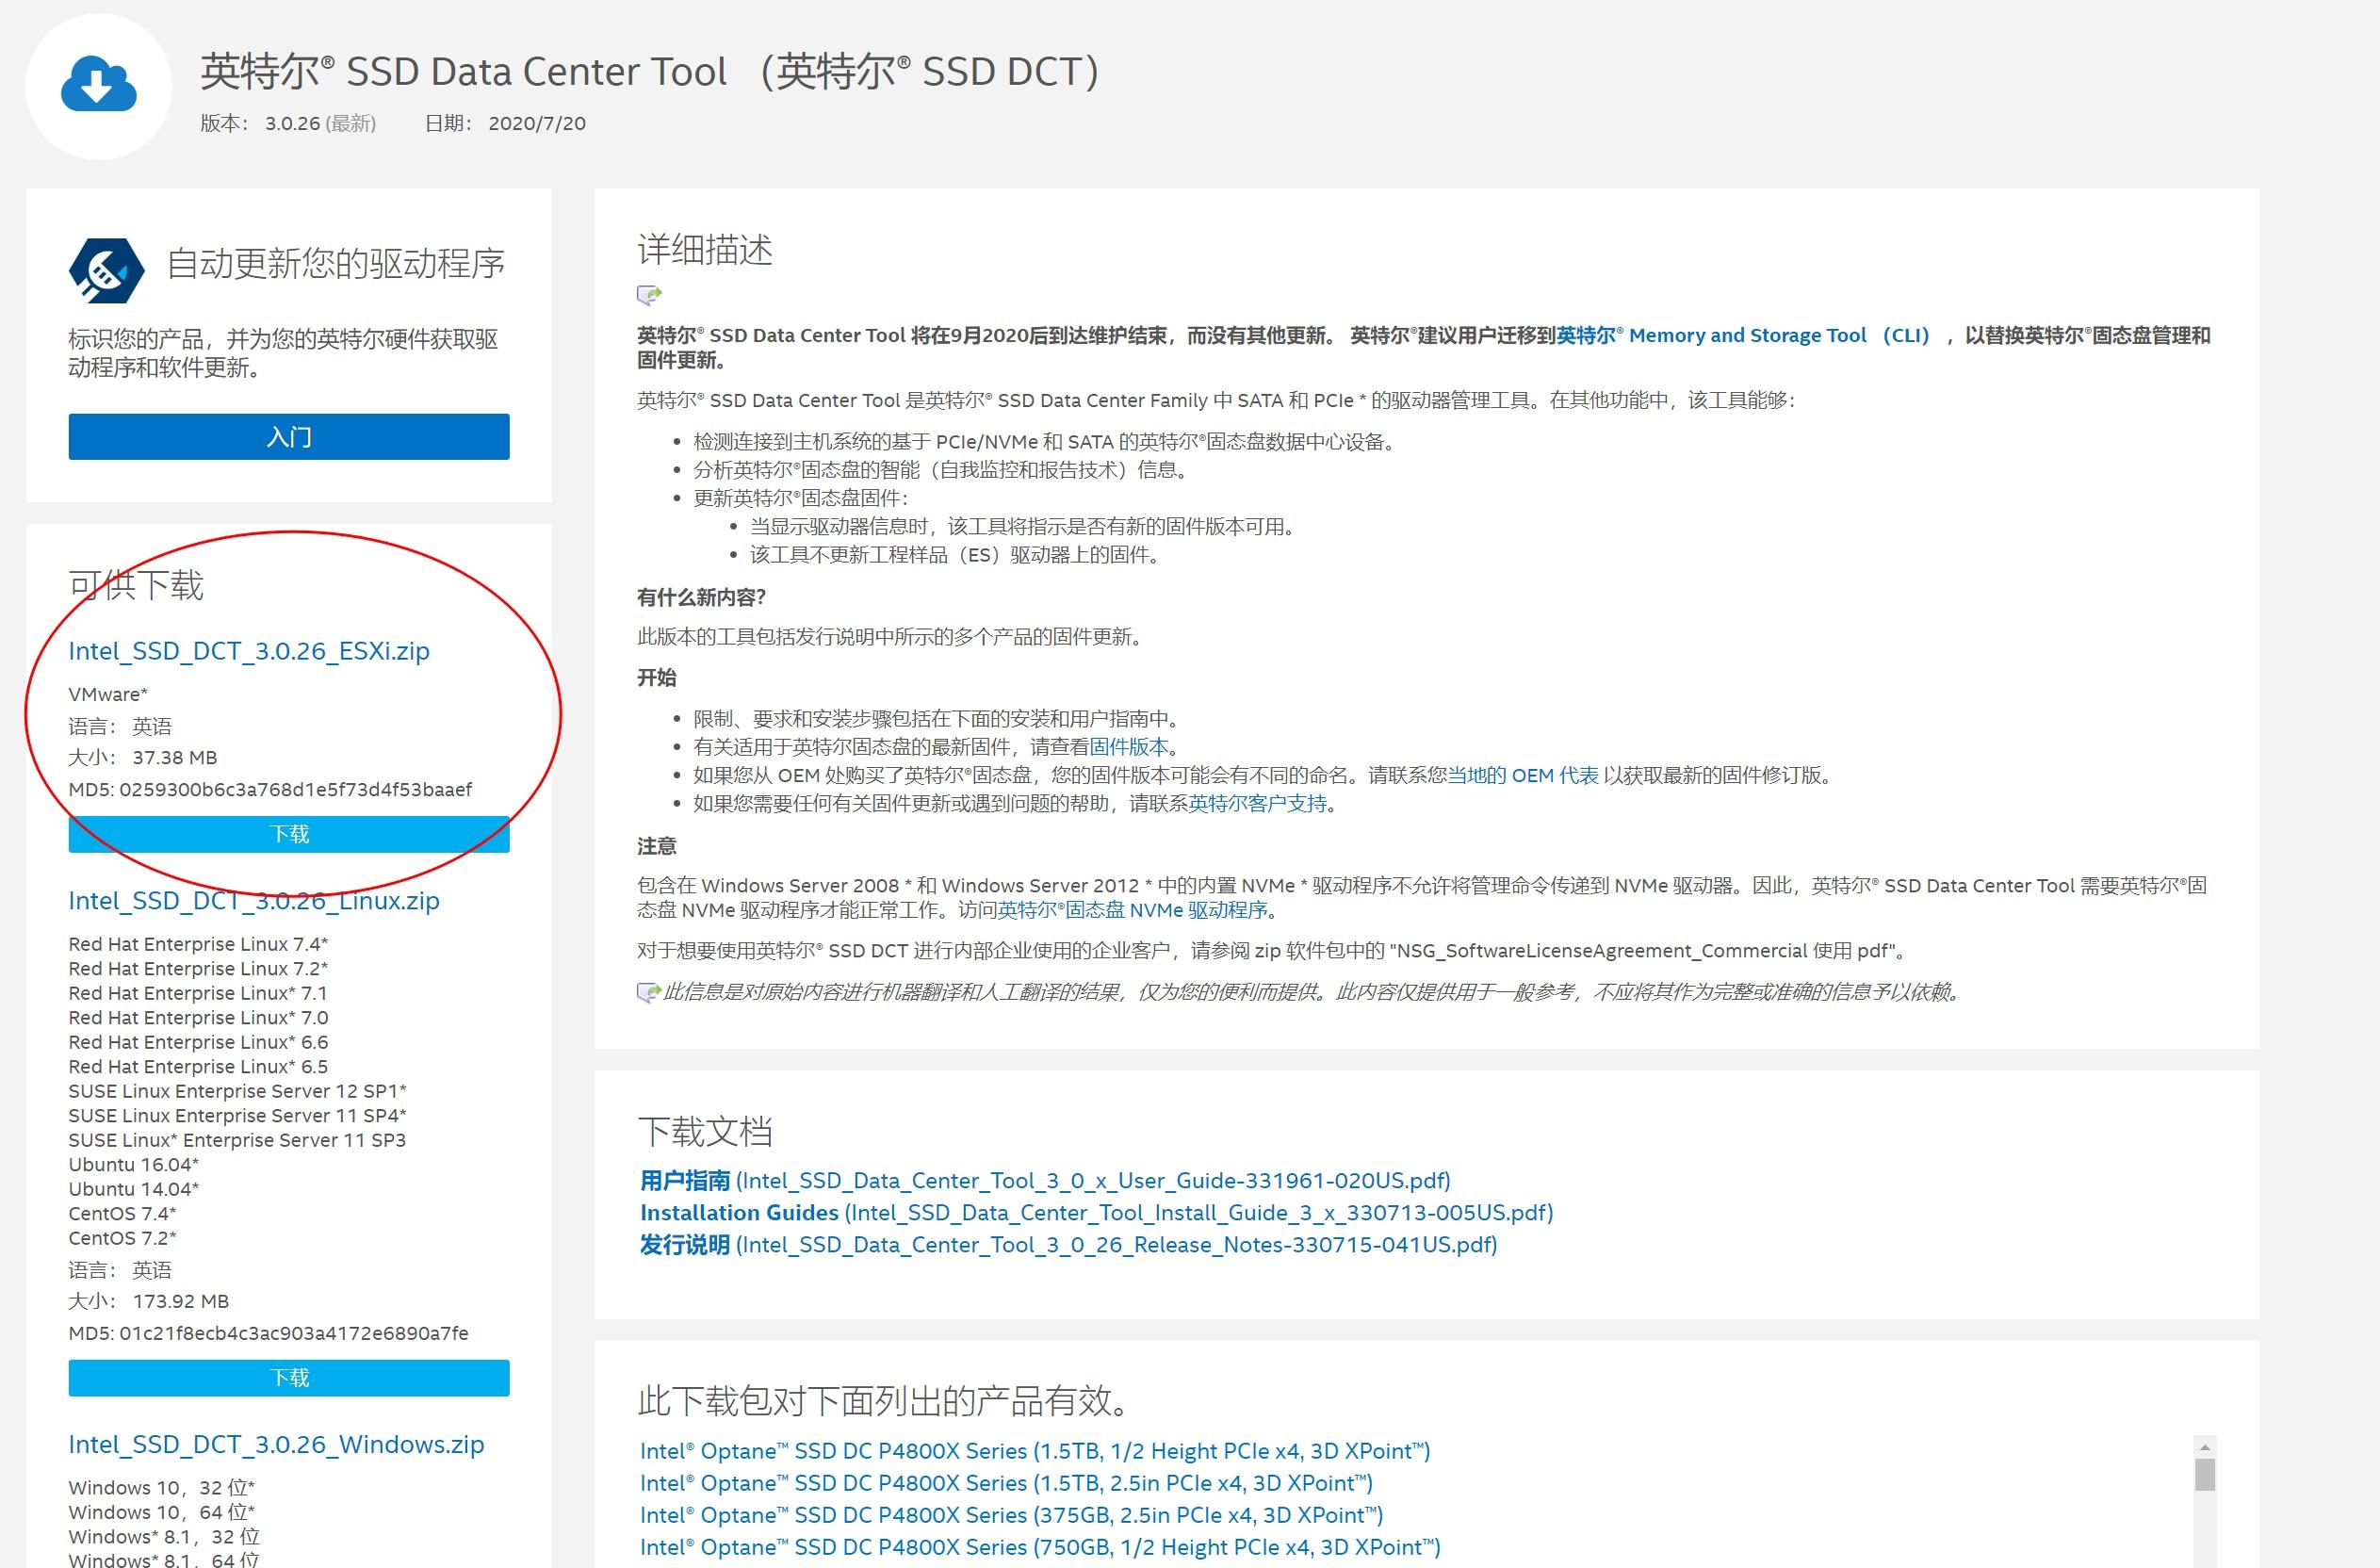 SSD Data Center Tool website